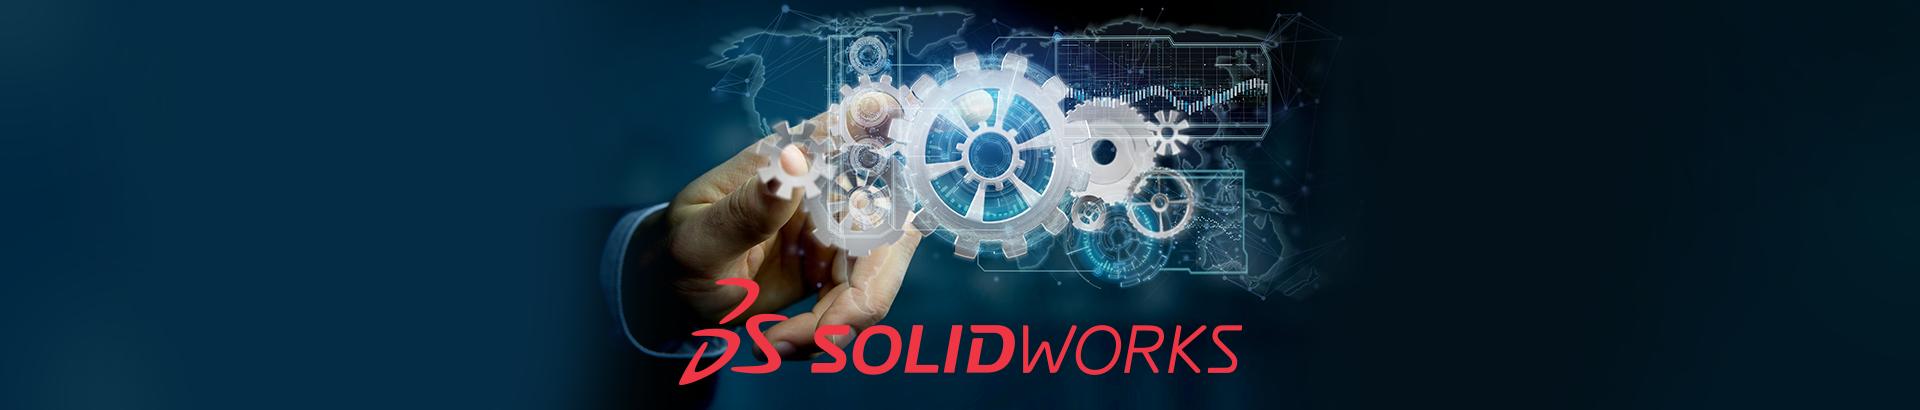 Solidworks Kampanya